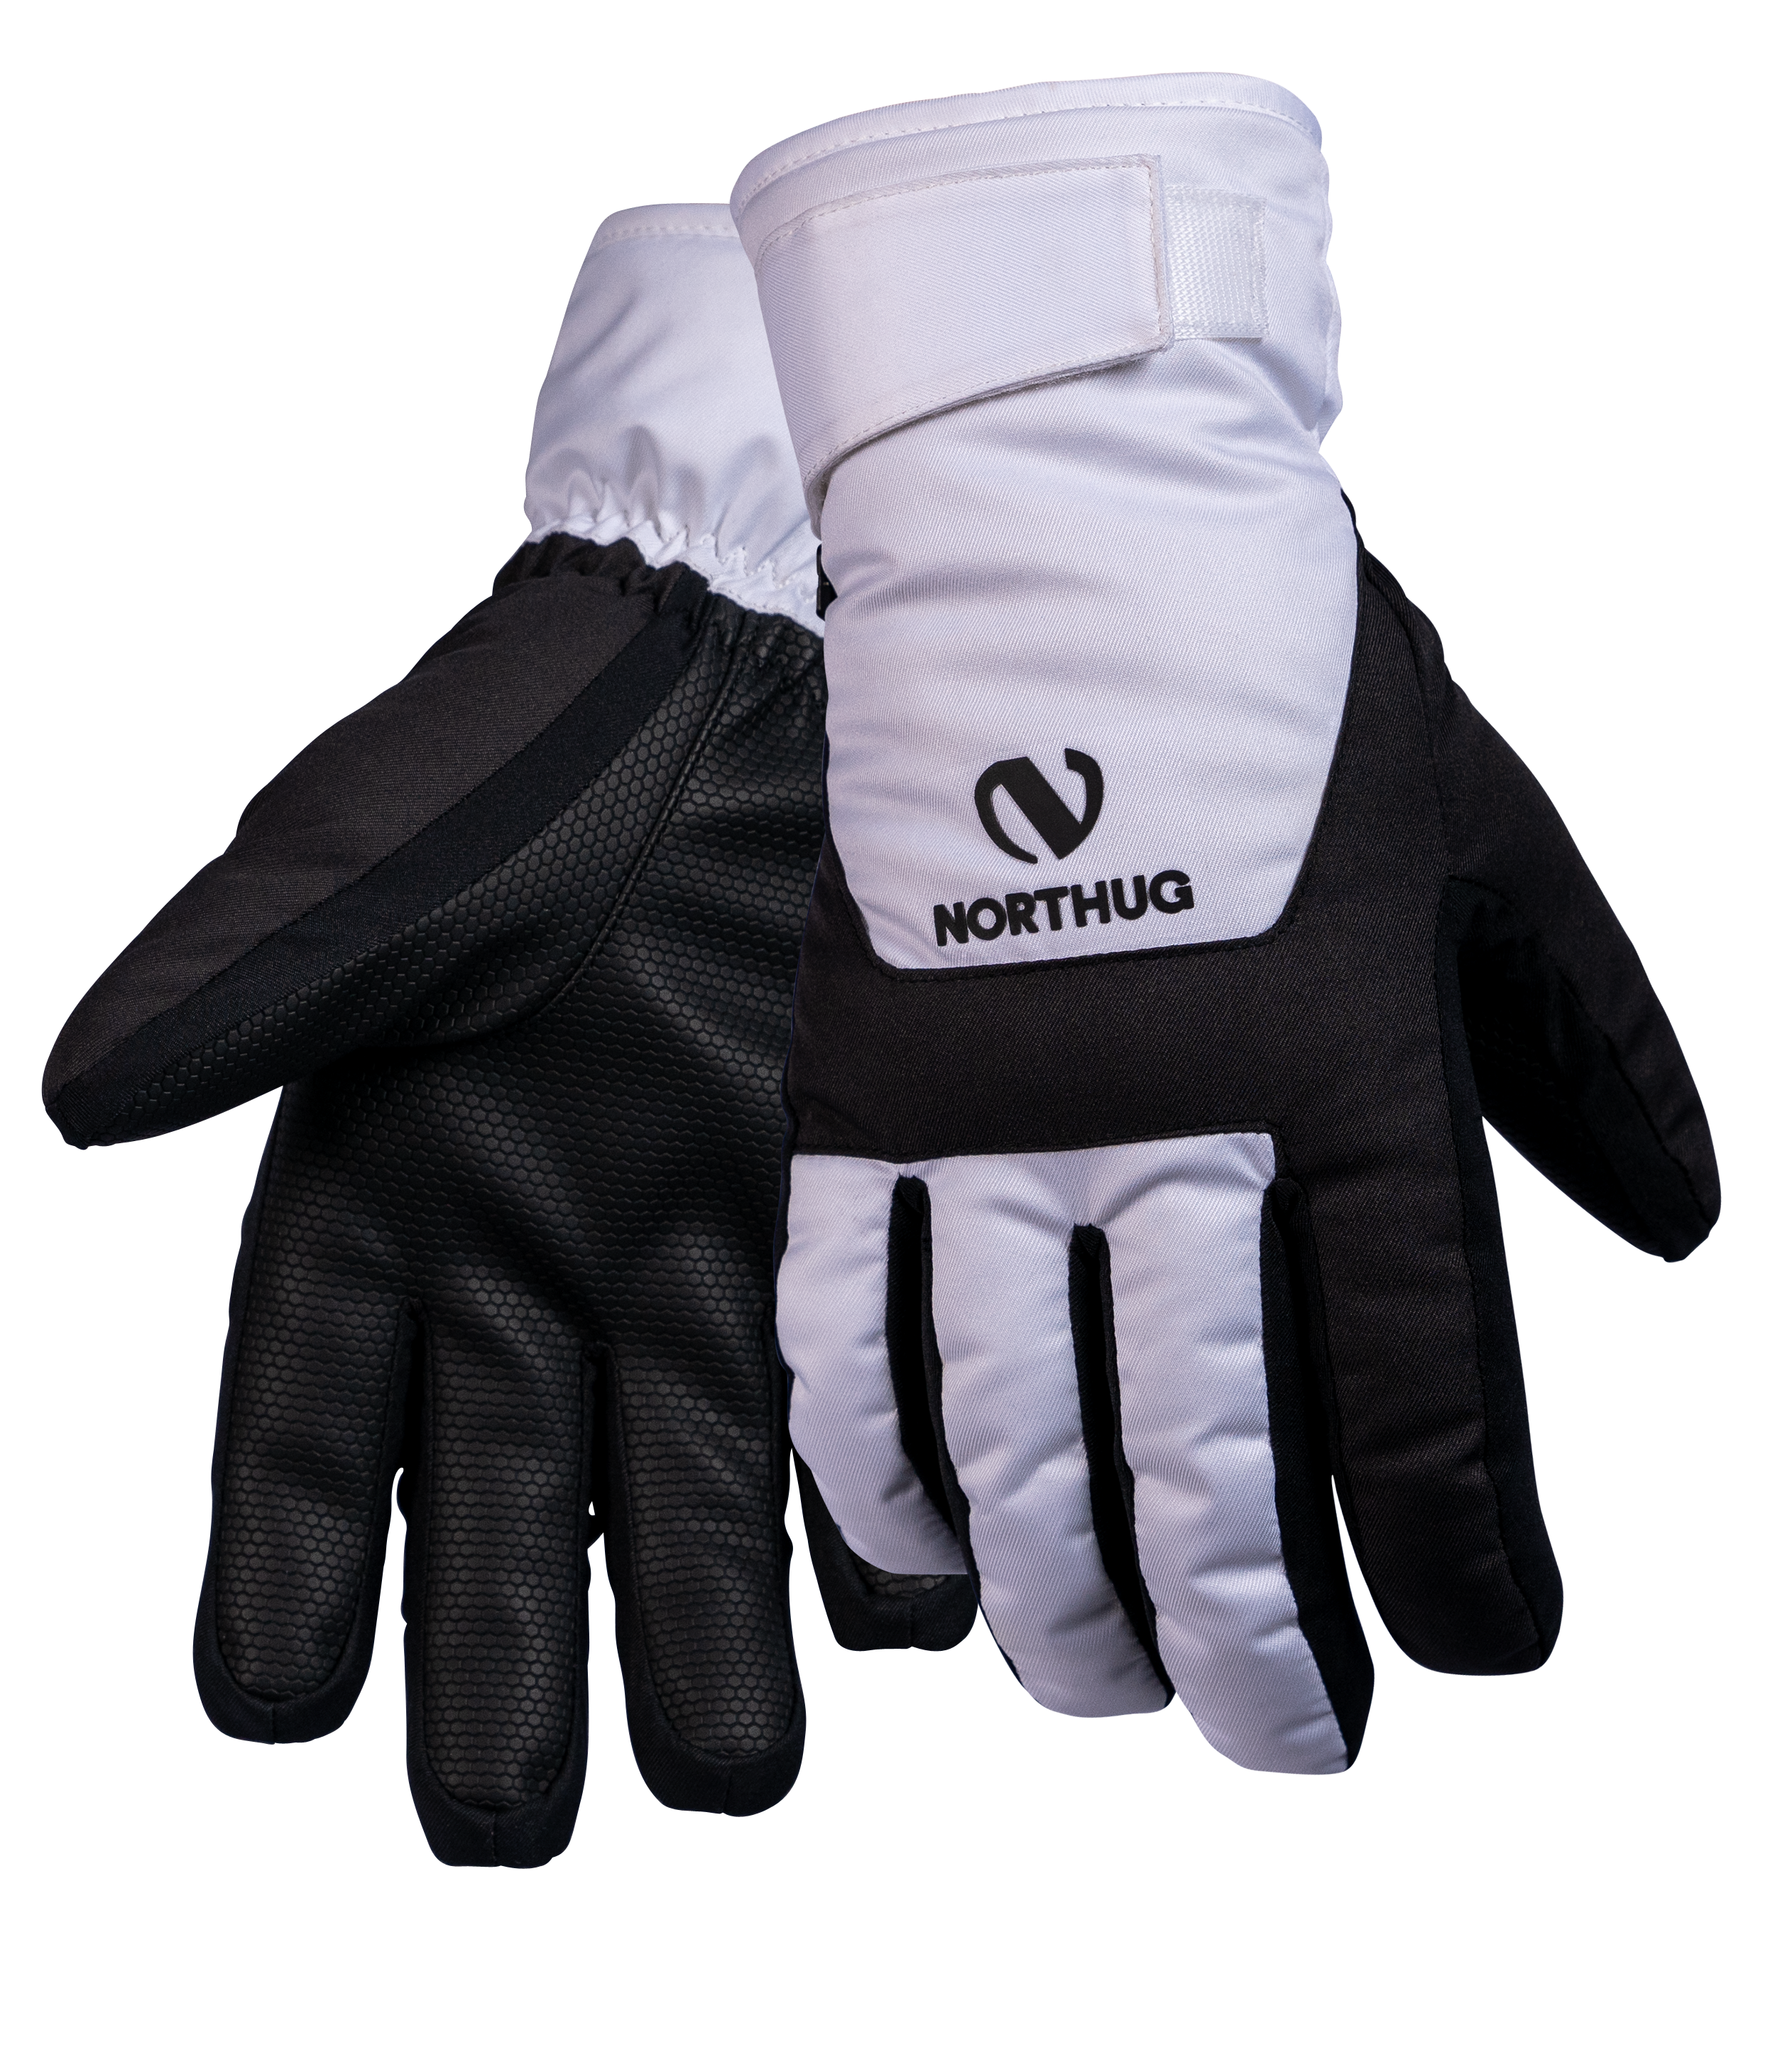 Northug Selli Insulated Glove, Unisex